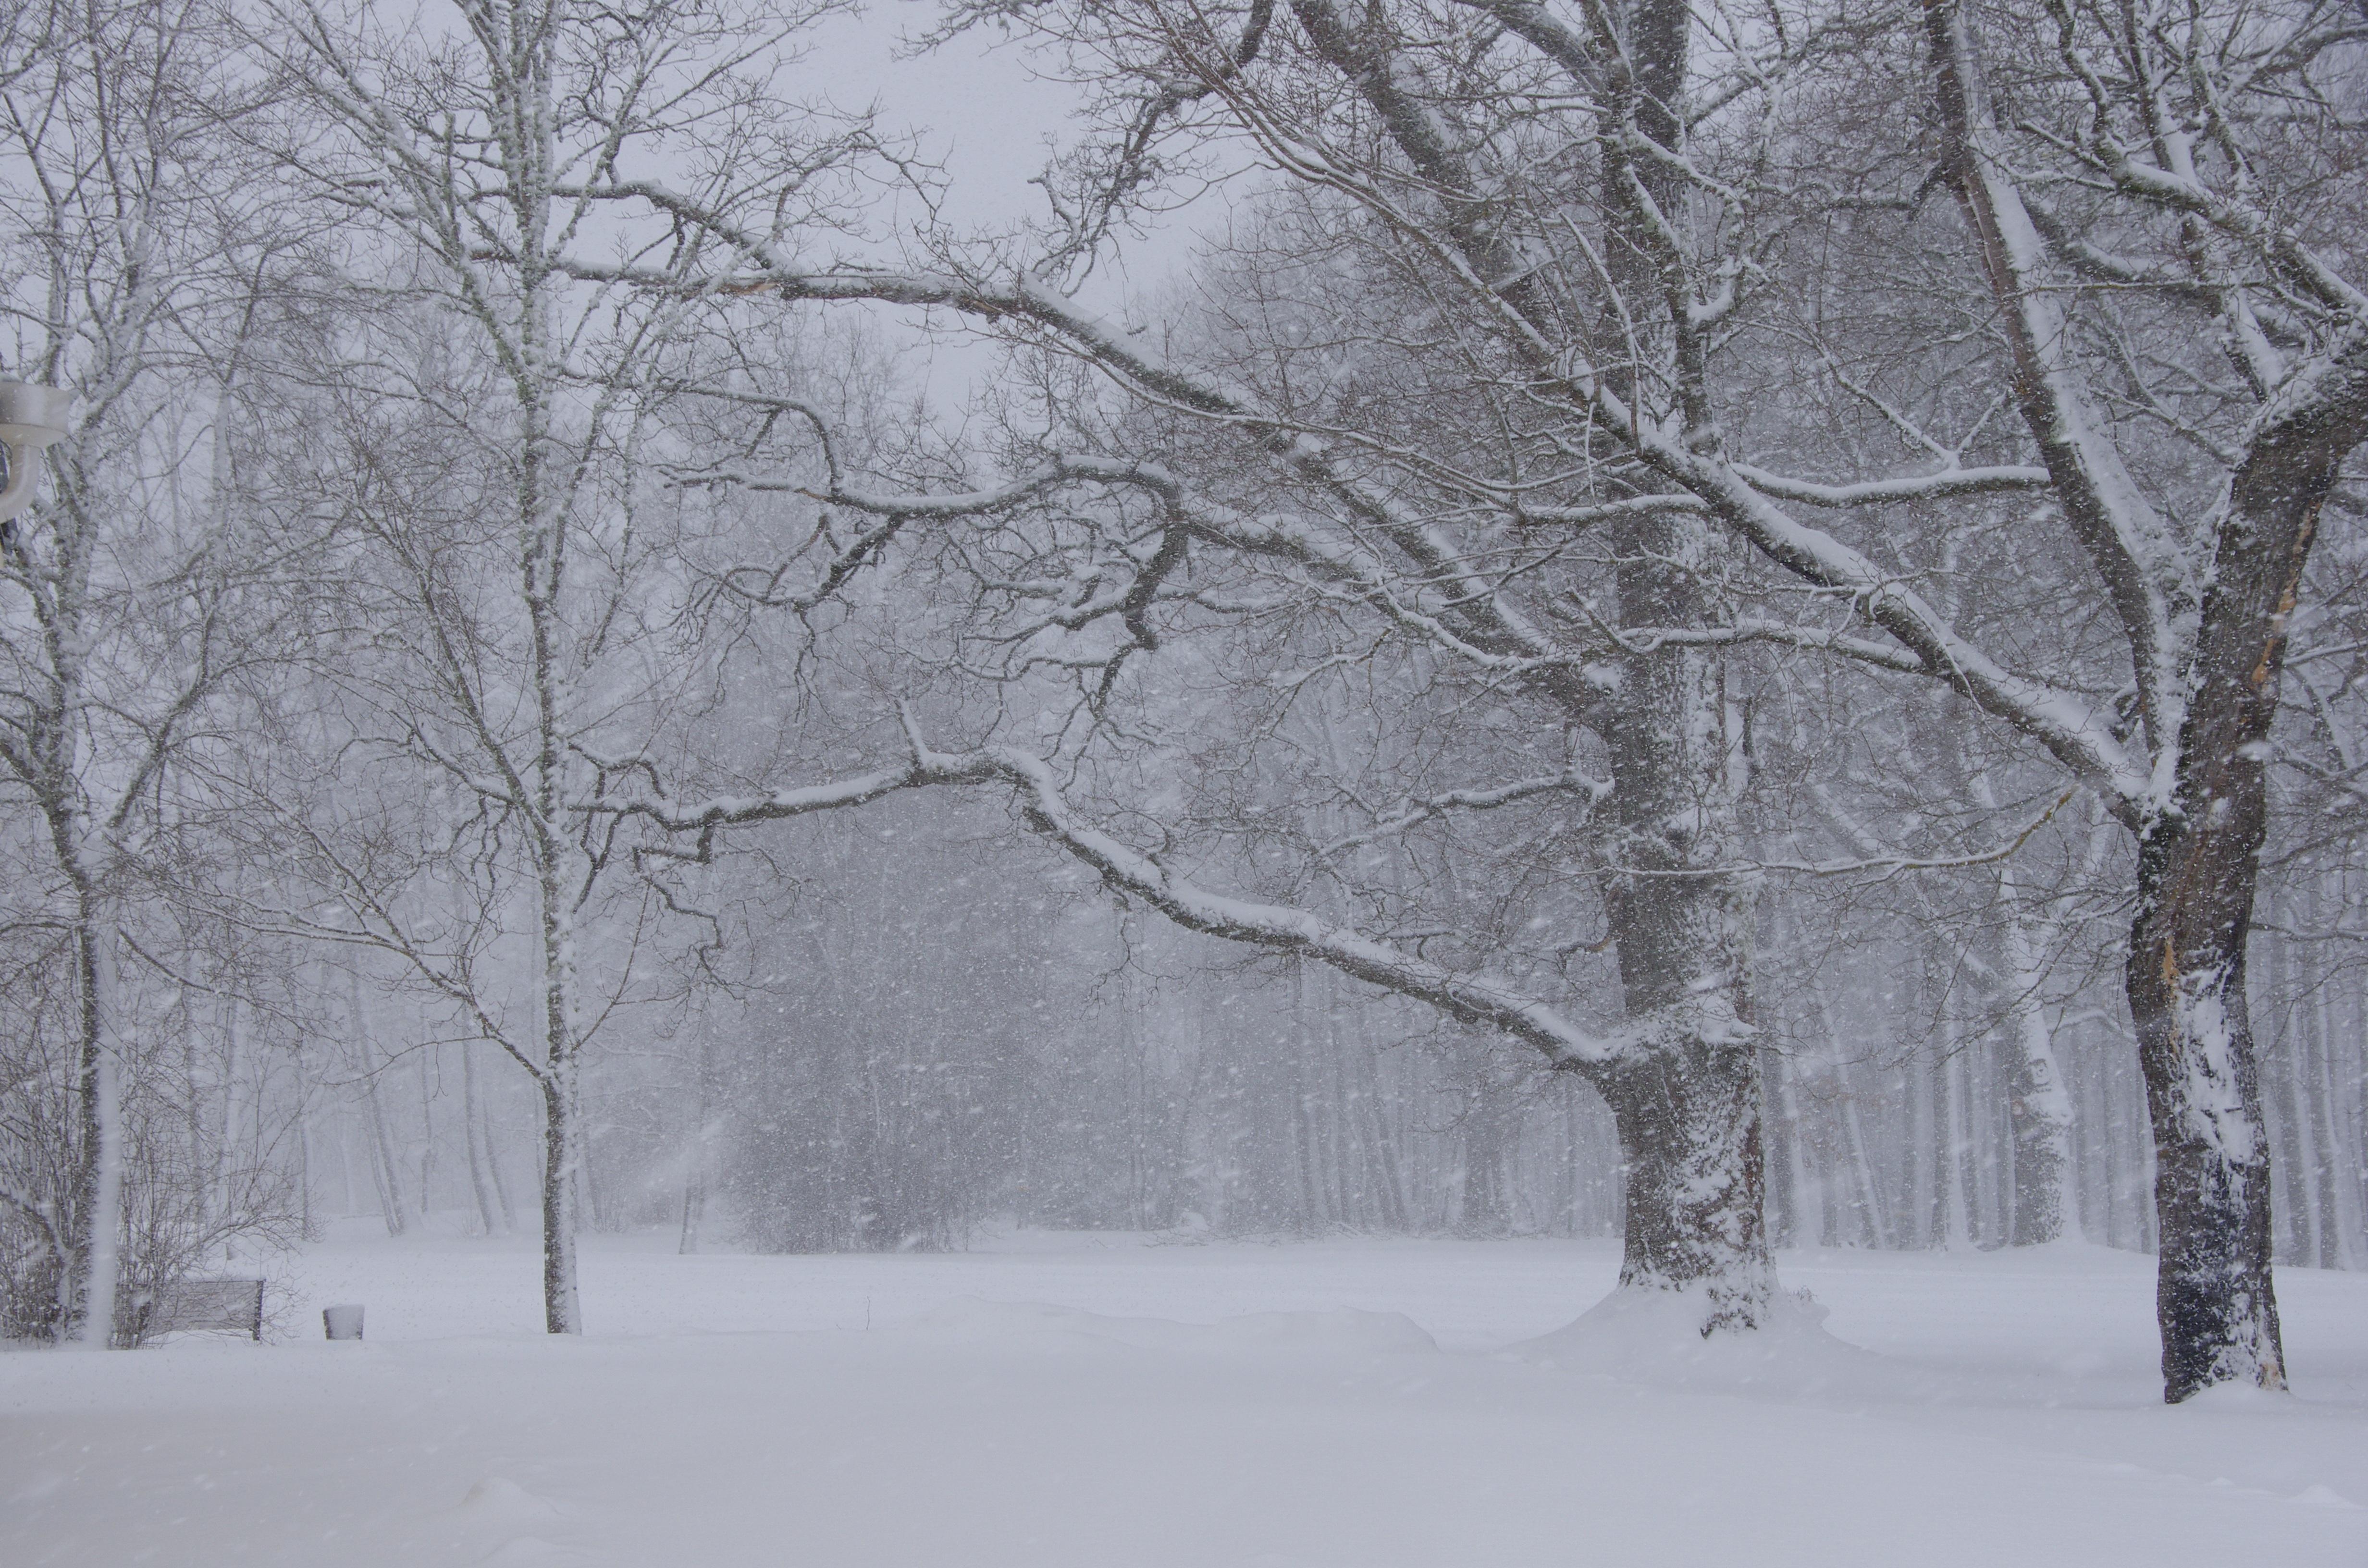 tree-nature-branch-snow-winter-frost-park-weather-season-snowing-blizzard-estonia-freezing-atmospheric-phenomenon-winter-storm-rain-and-snow-mixed-739021